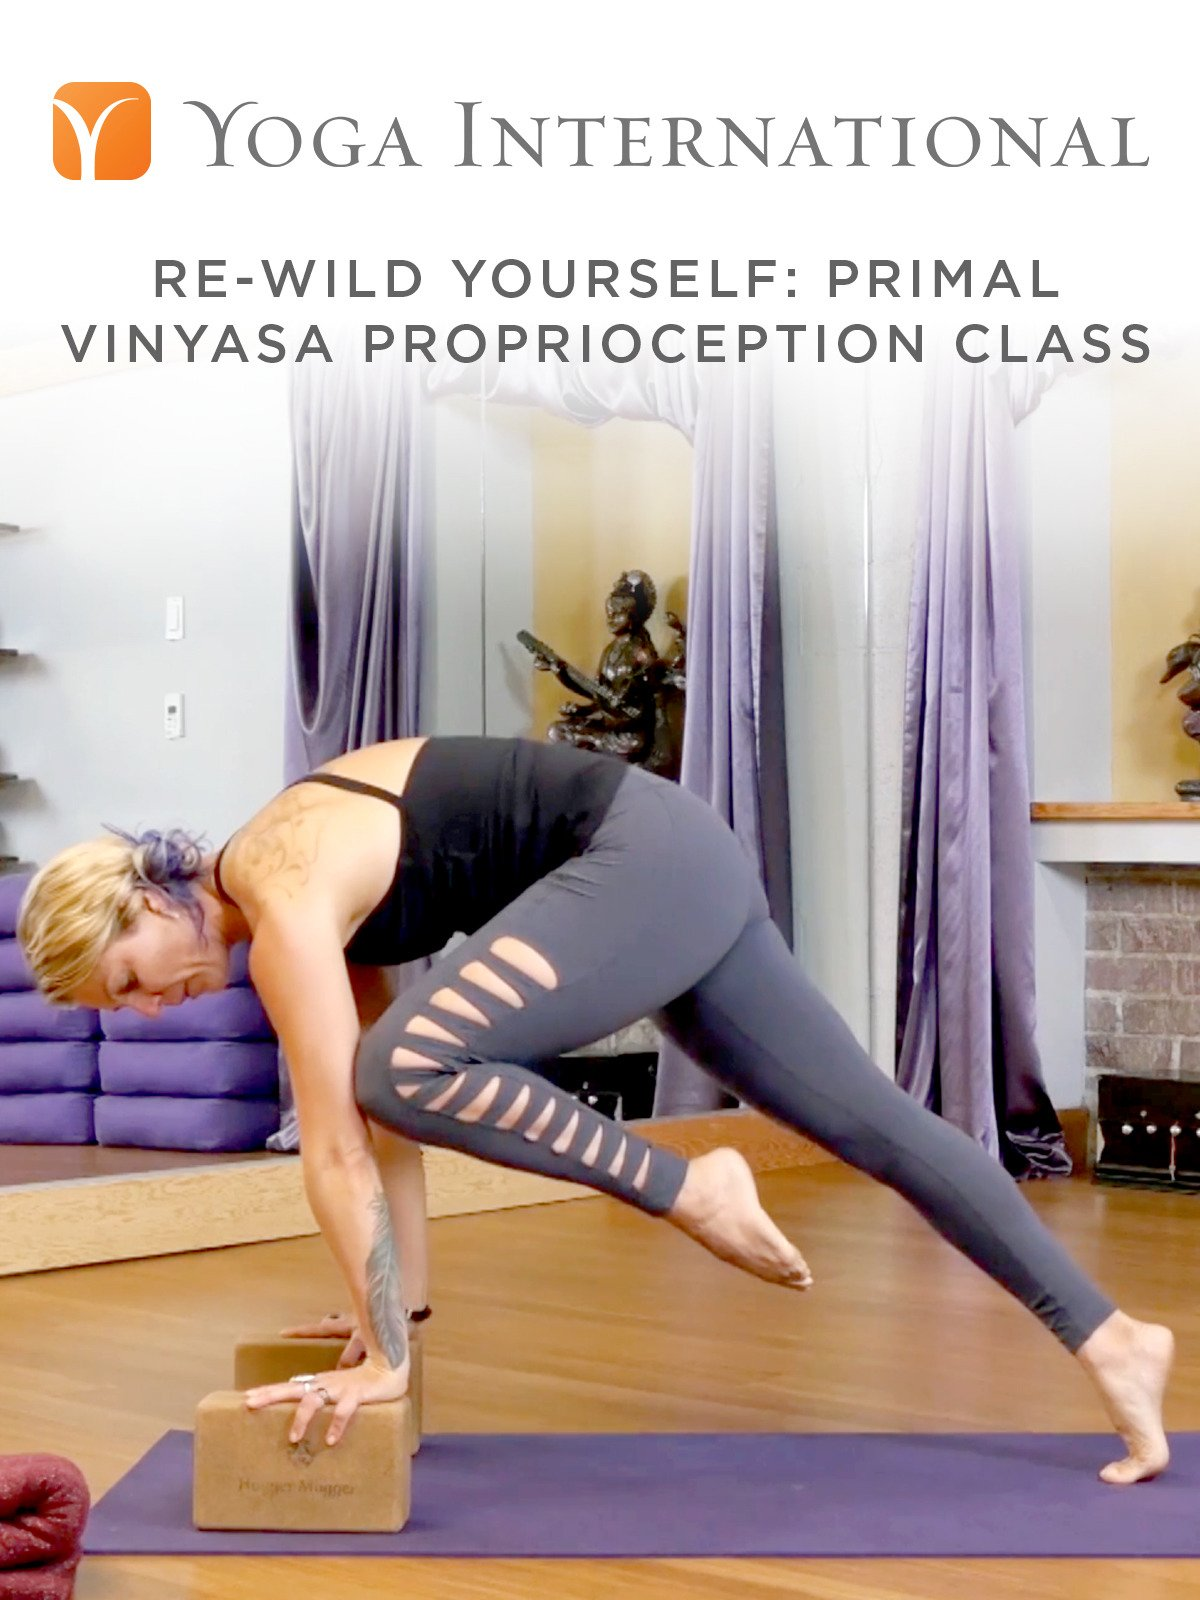 Amazon.com: Watch Re-Wild Yourself: Primal Vinyasa ...